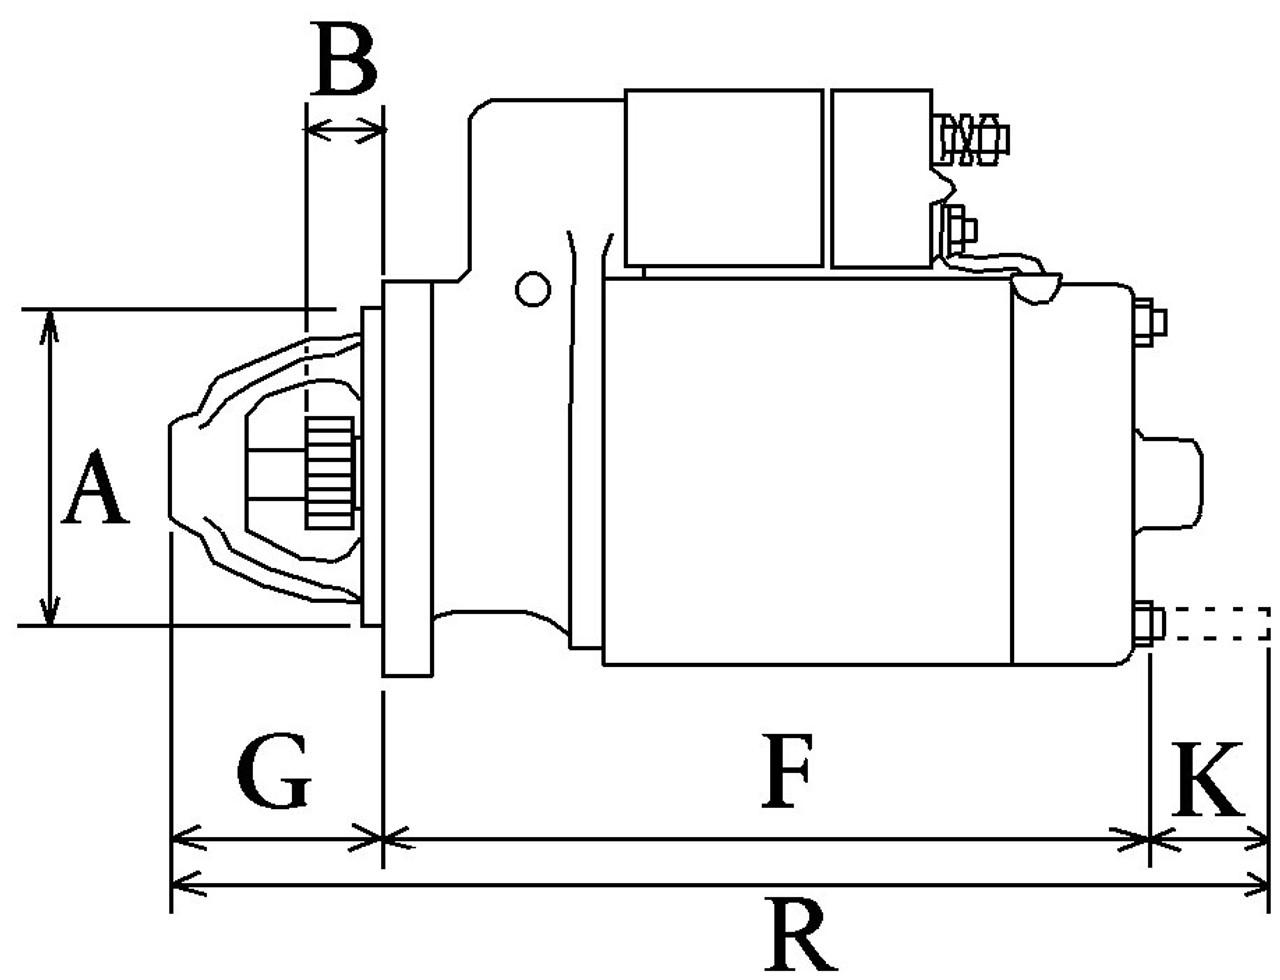 small resolution of 3gm30f yanmar starter motor wiring diagram yanmar 3gm30f partsyanmar 3gm30 starter motor on yanmar 3gm30f parts